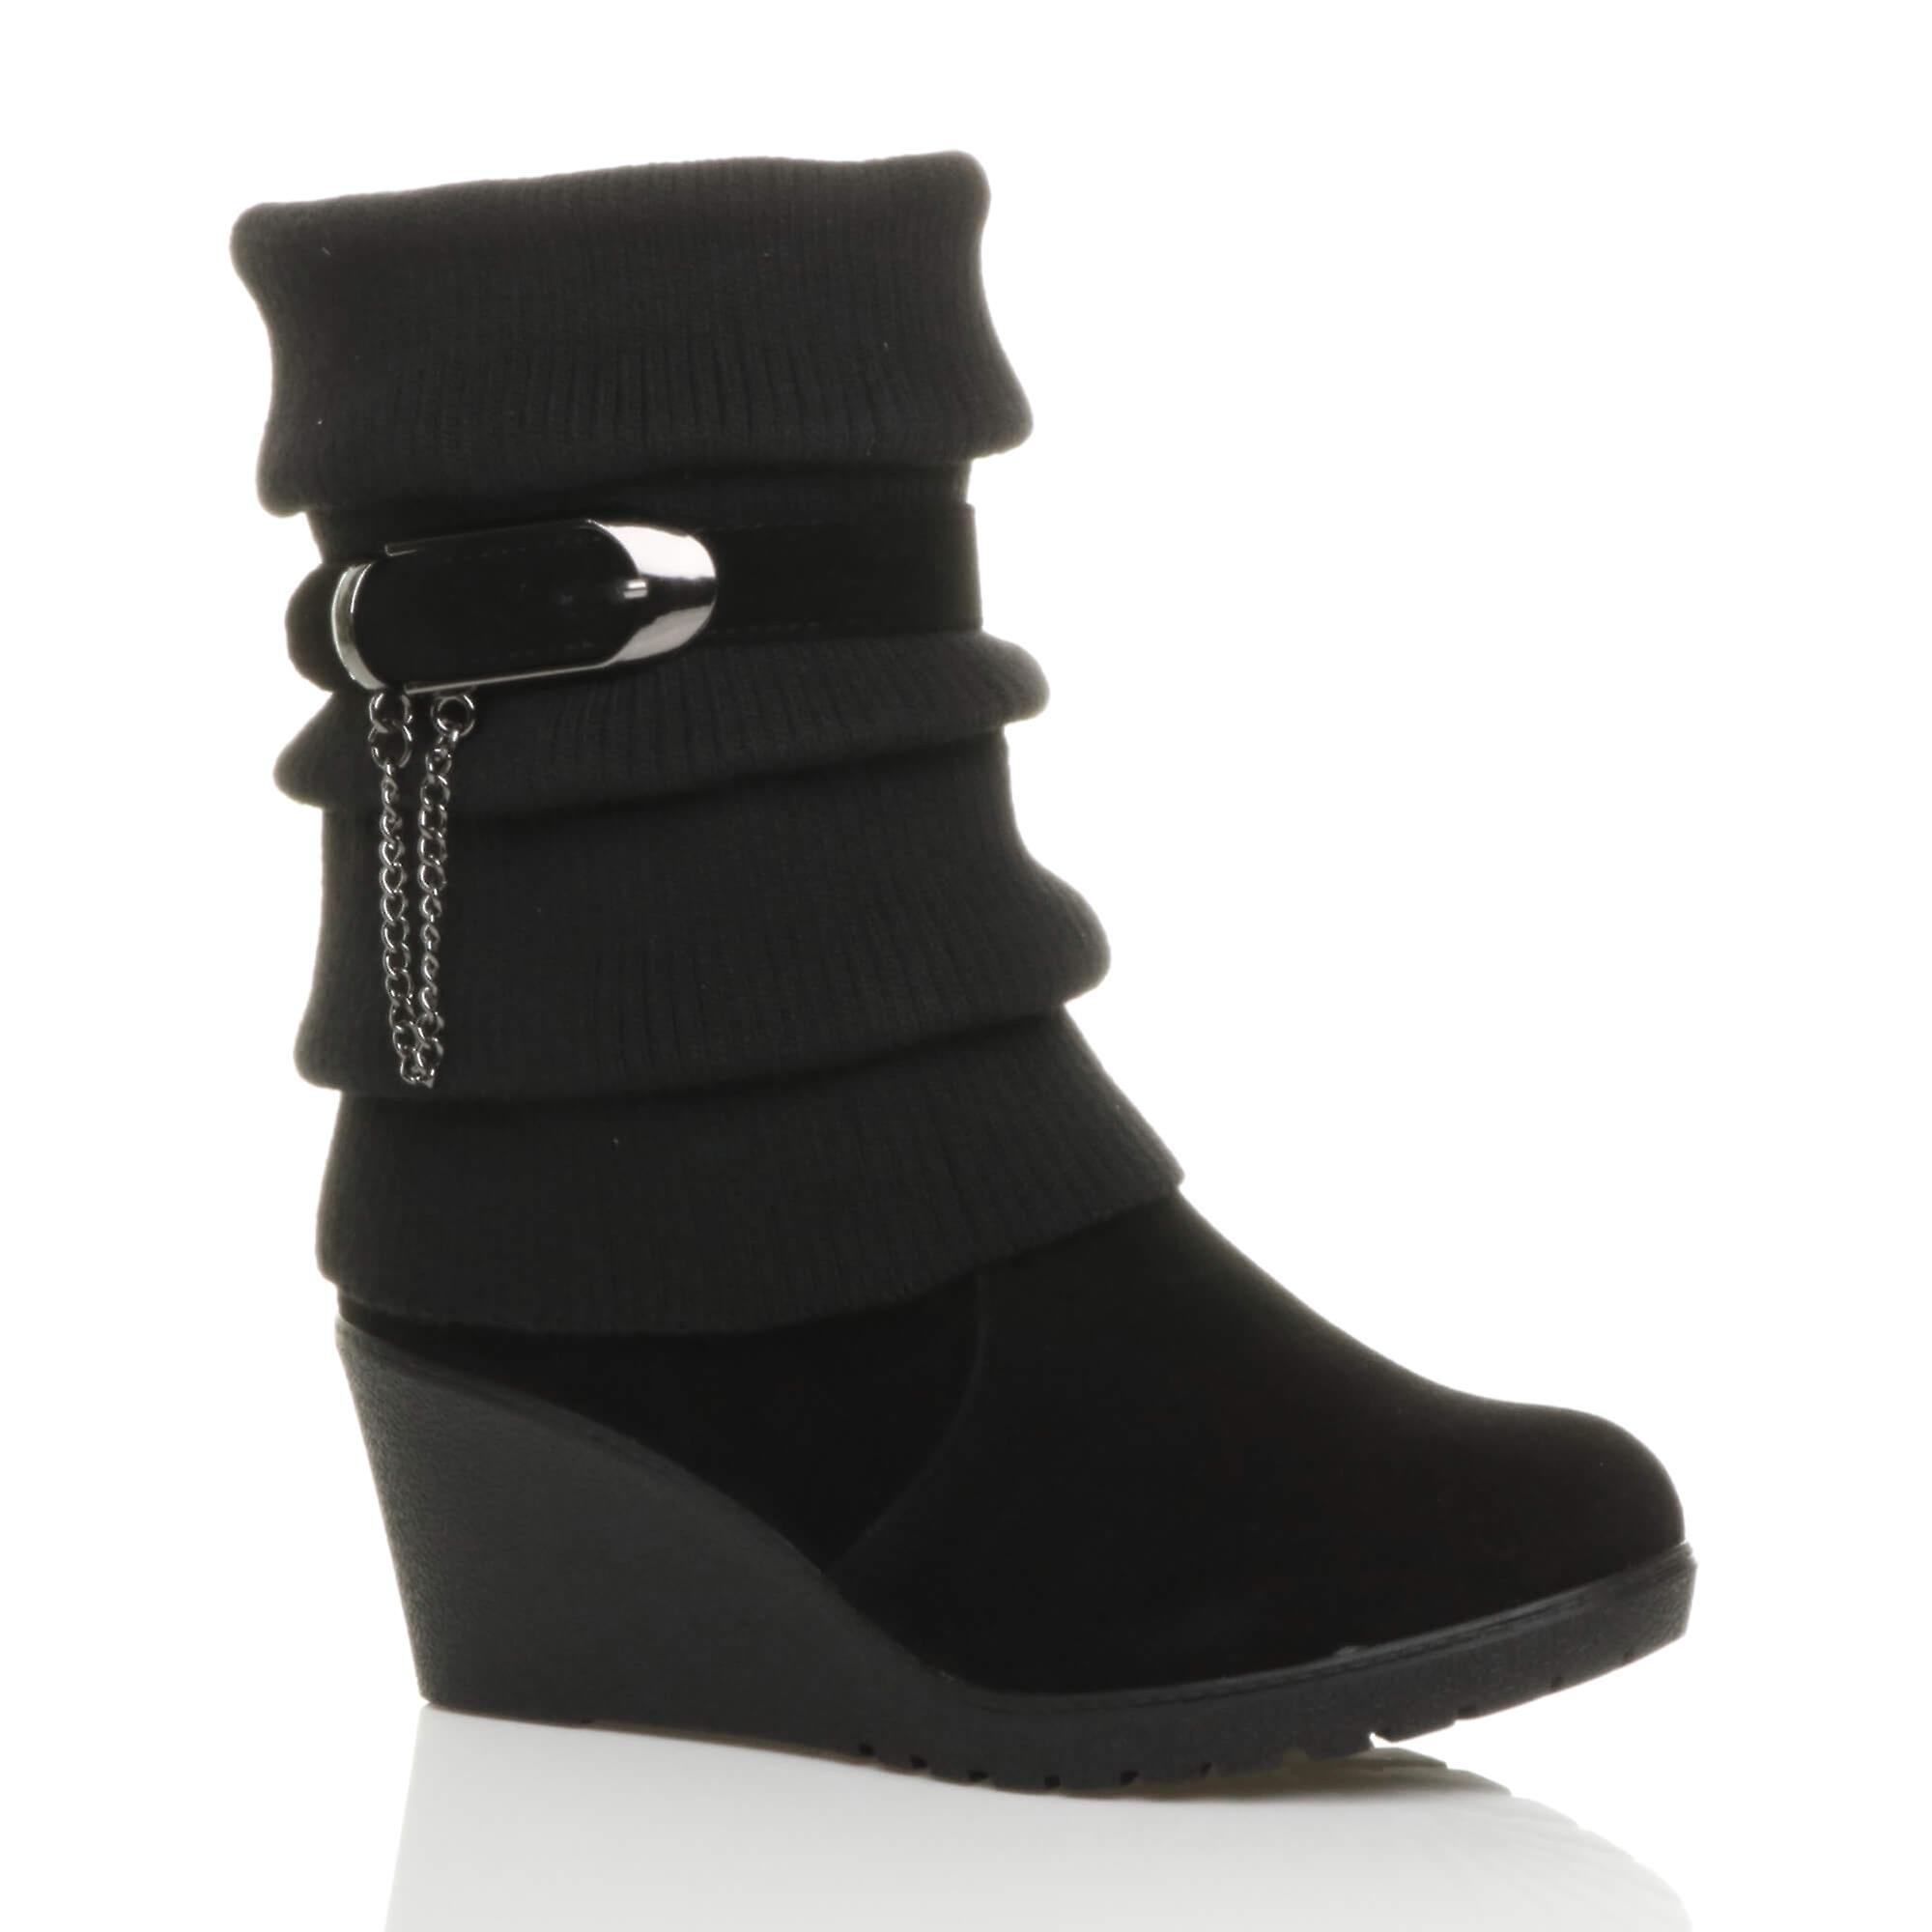 Ajvani womens mid high heel wedge platform biker knitted collar slouch winter calf ankle boots nrNB0